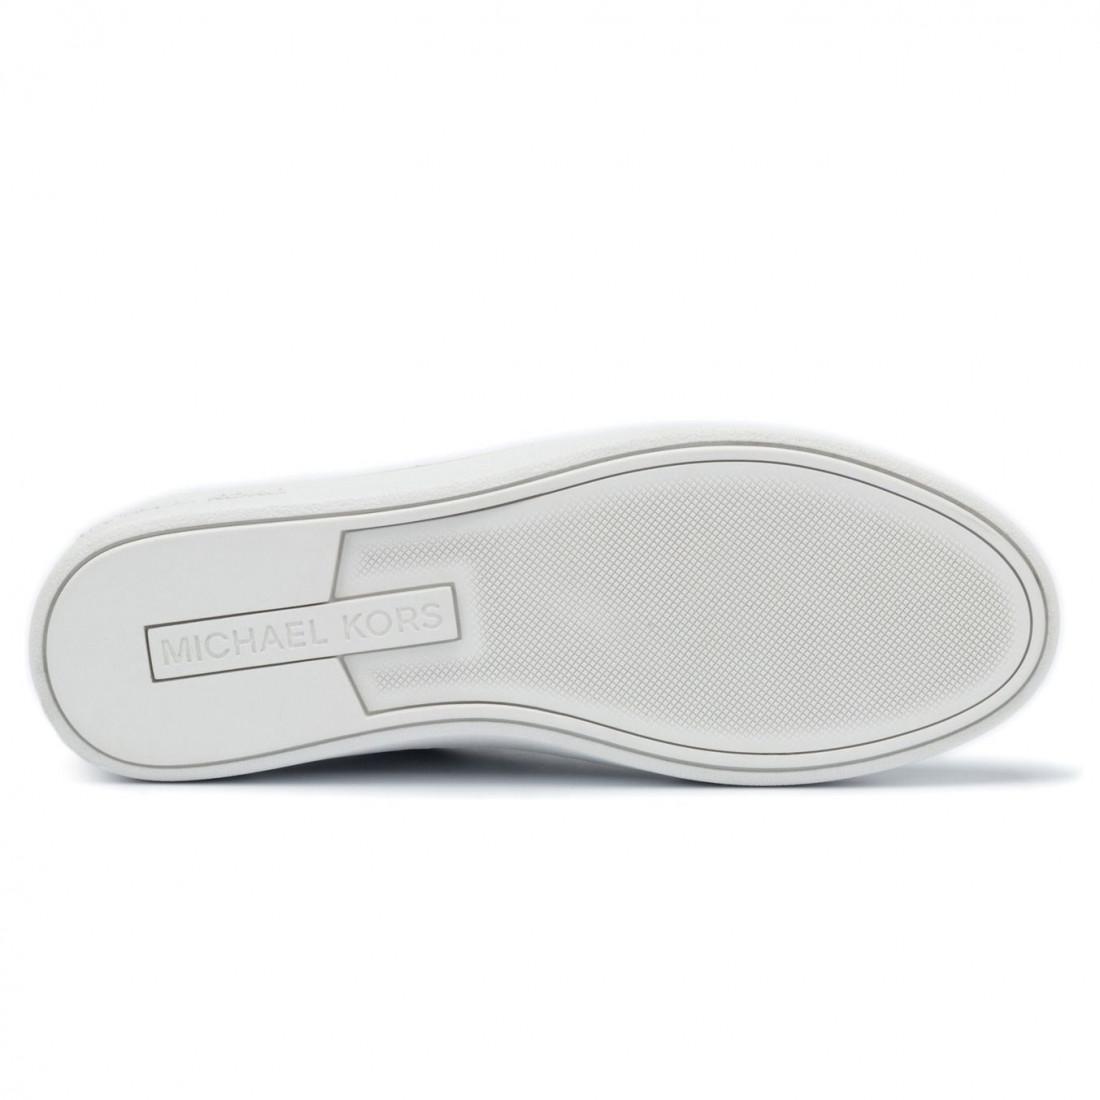 sneakers donna michael kors 43s7irfs3l272 7354